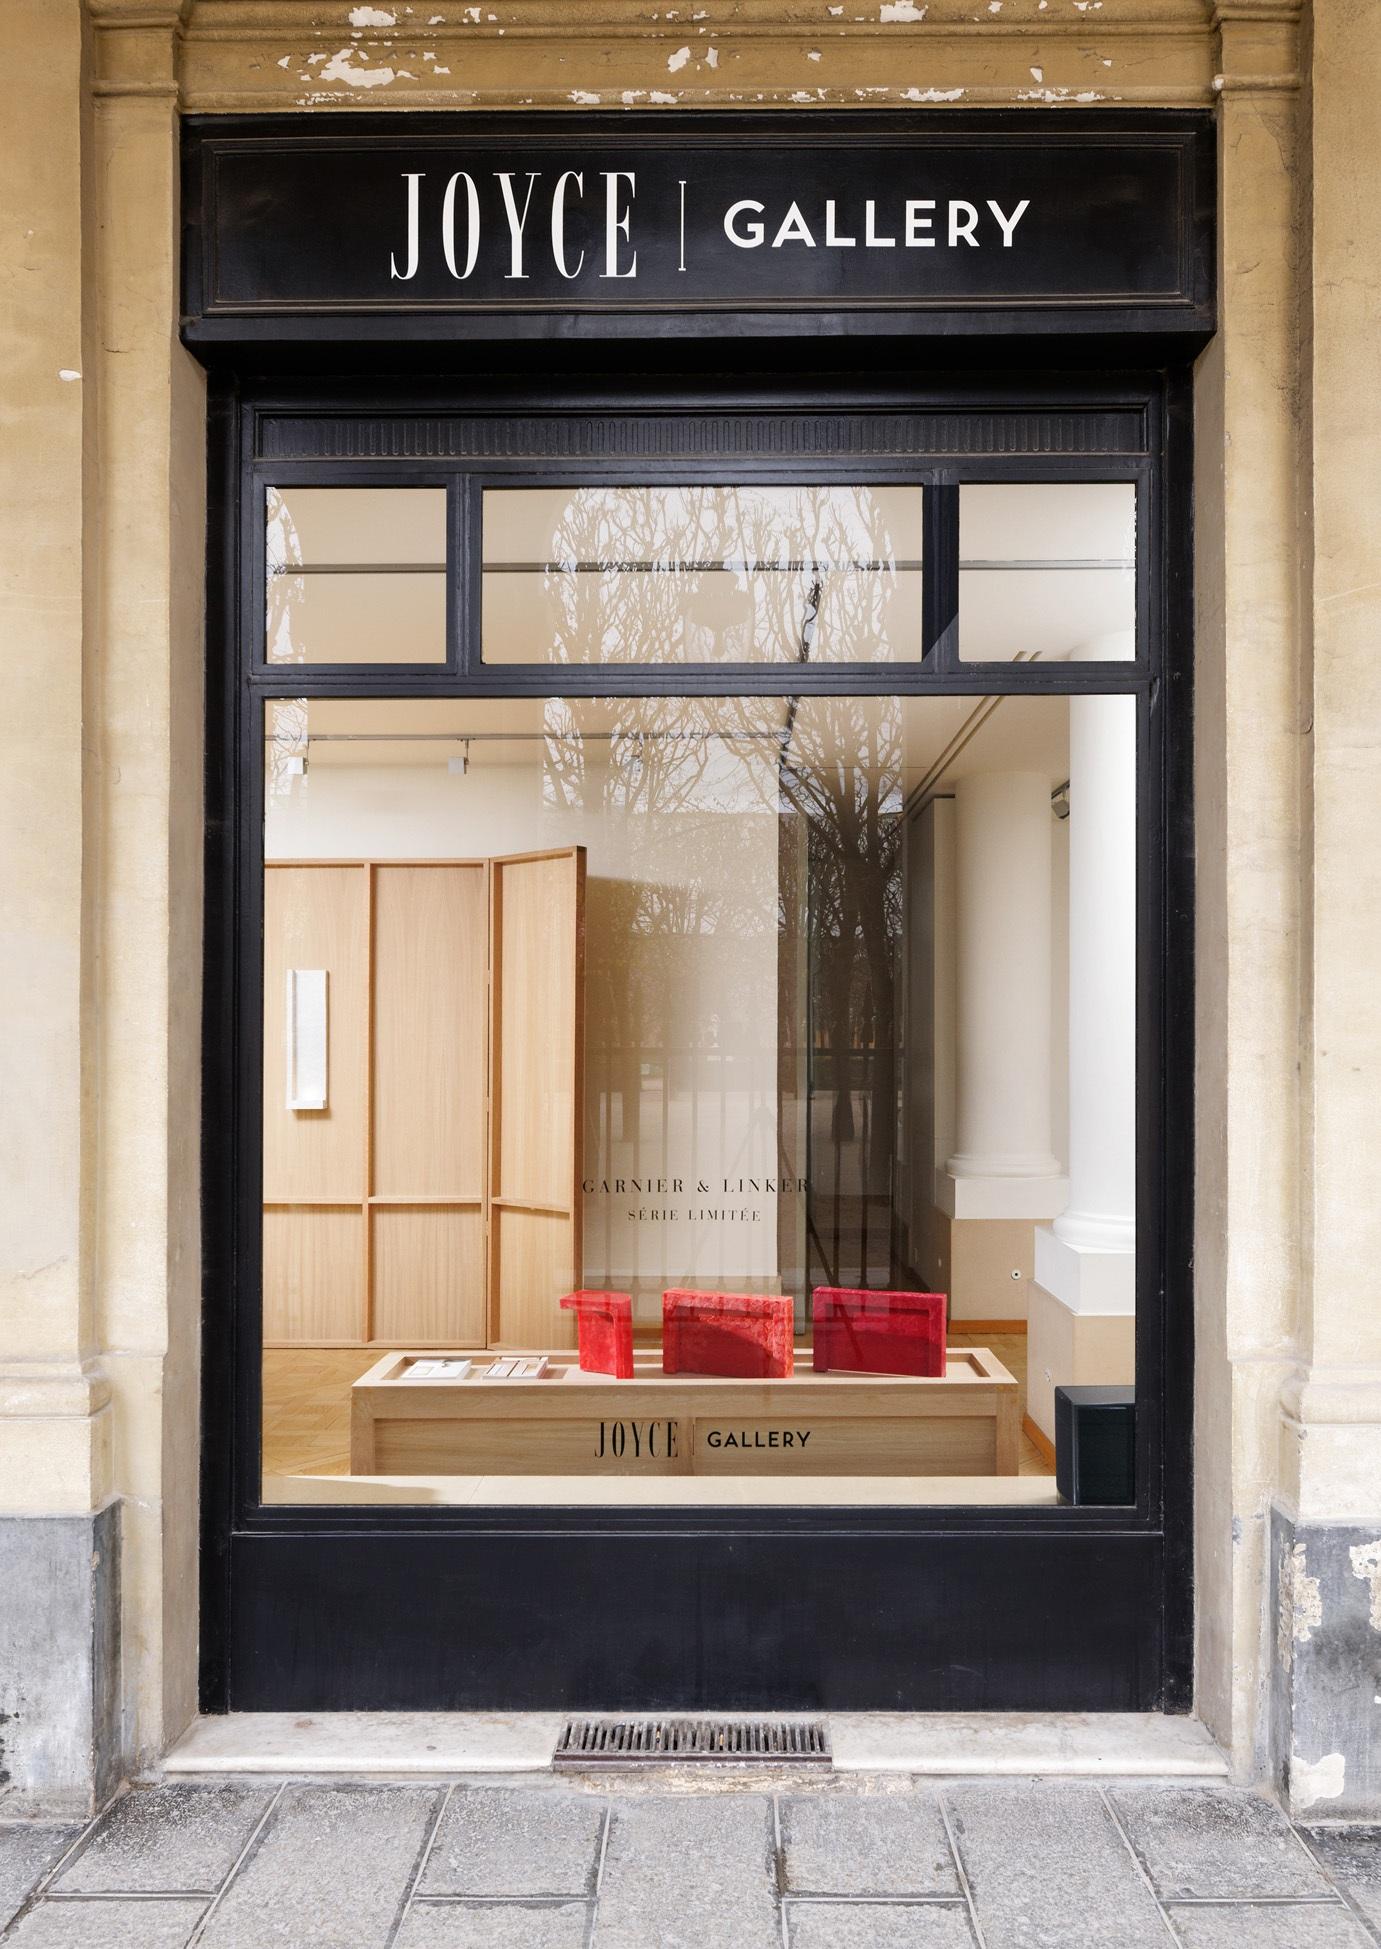 SOLO SHOW / Joyce Gallery, March 2019, Paris - France